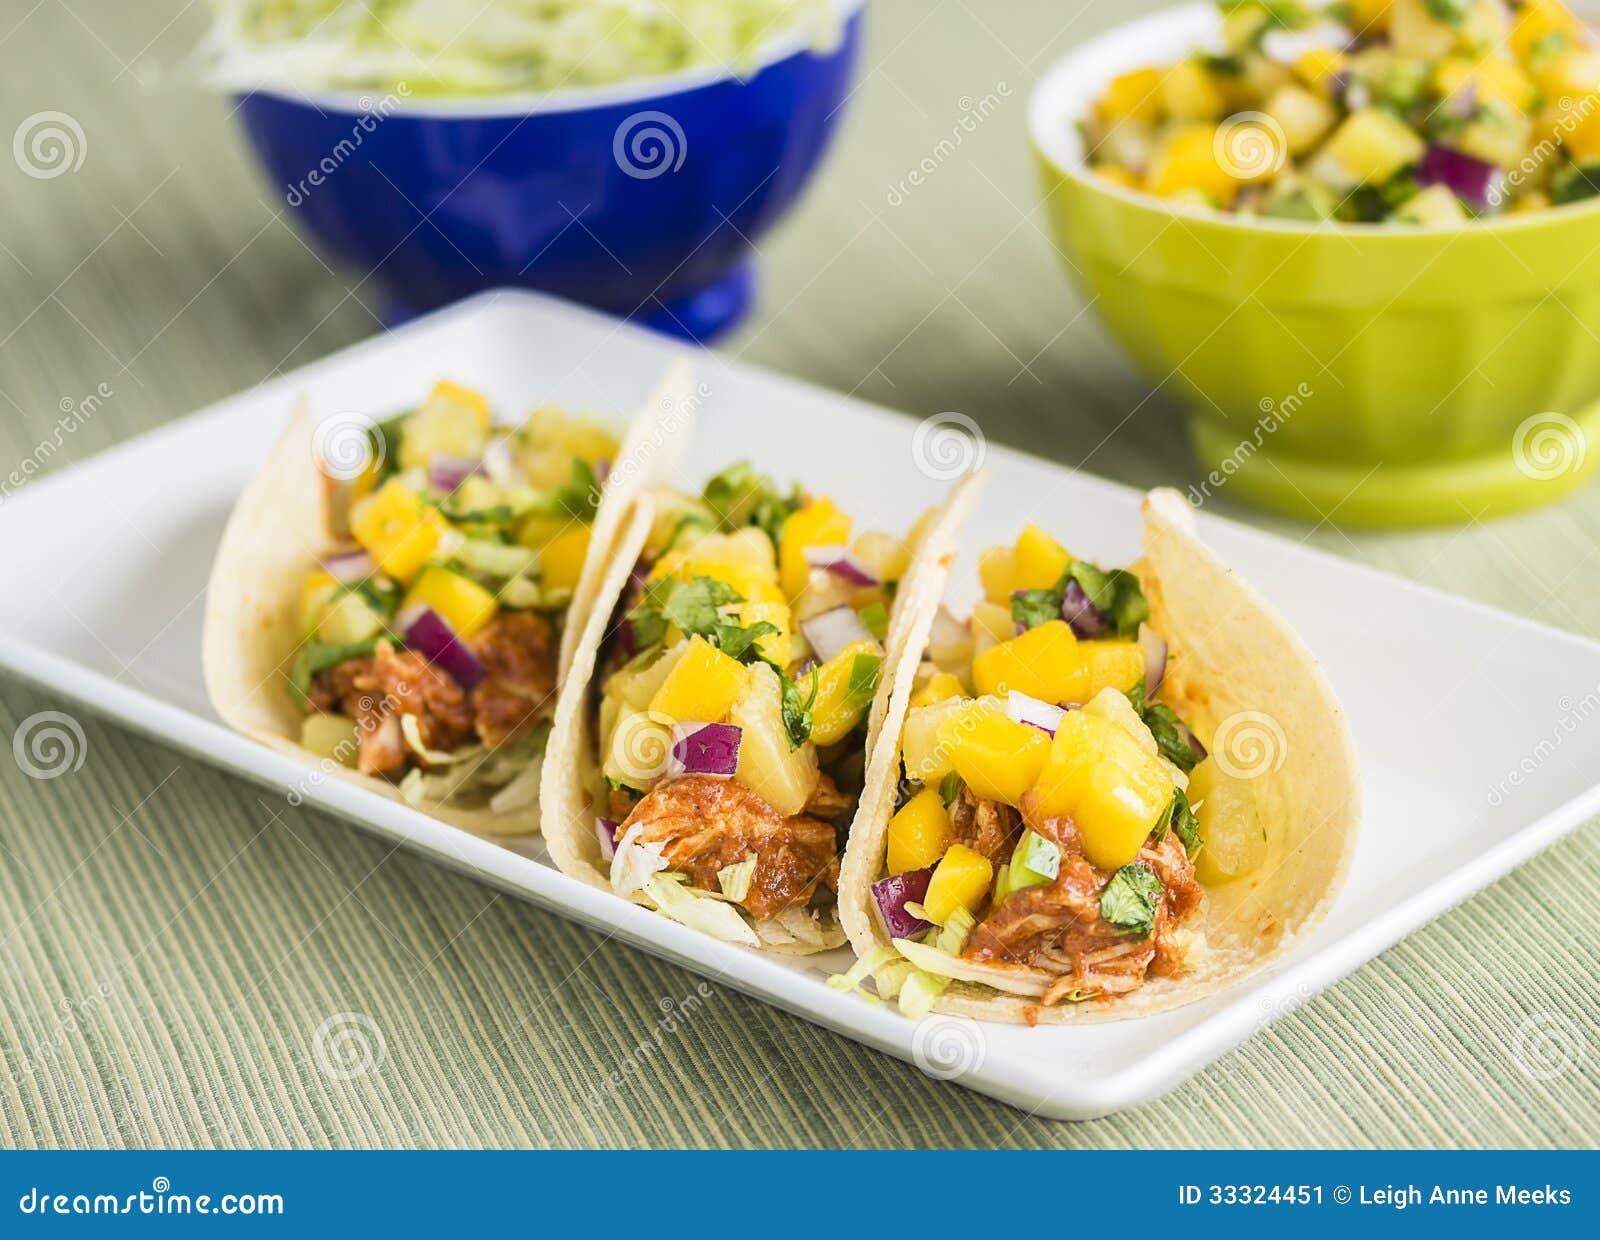 Hawaiian Bbq Chicken Tacos Stock Image Image Of Color 33324451